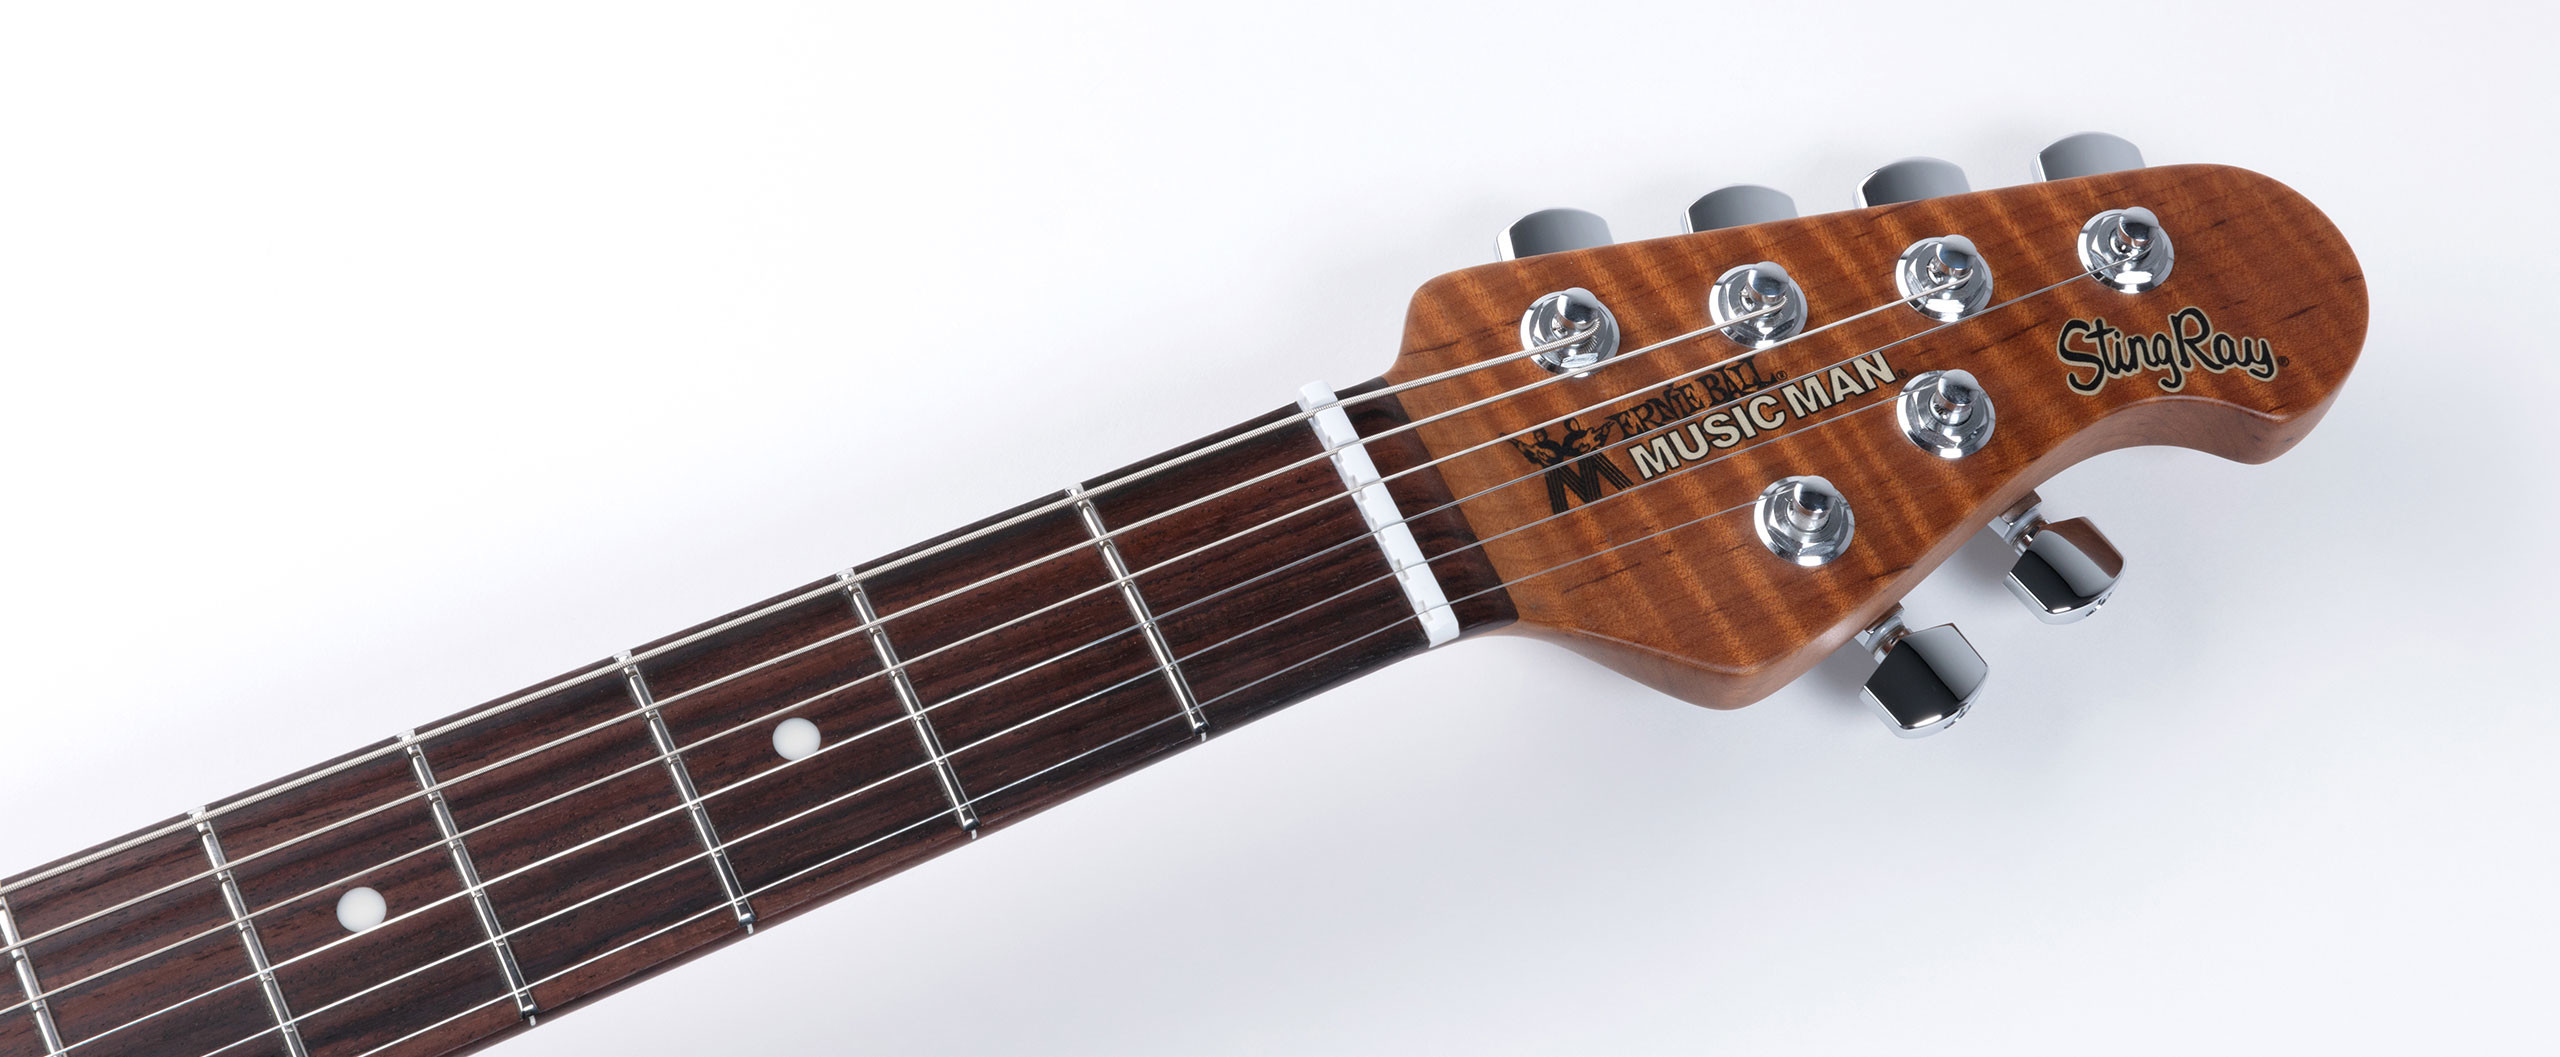 StingRay RS Guitar | Guitars | Ernie Ball Music Man